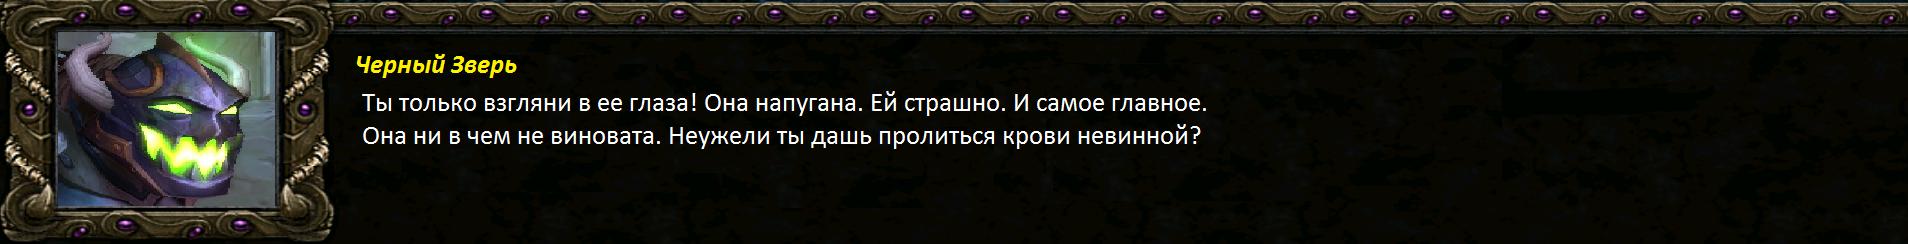 Диалог ДкВар 13 эпизод 28